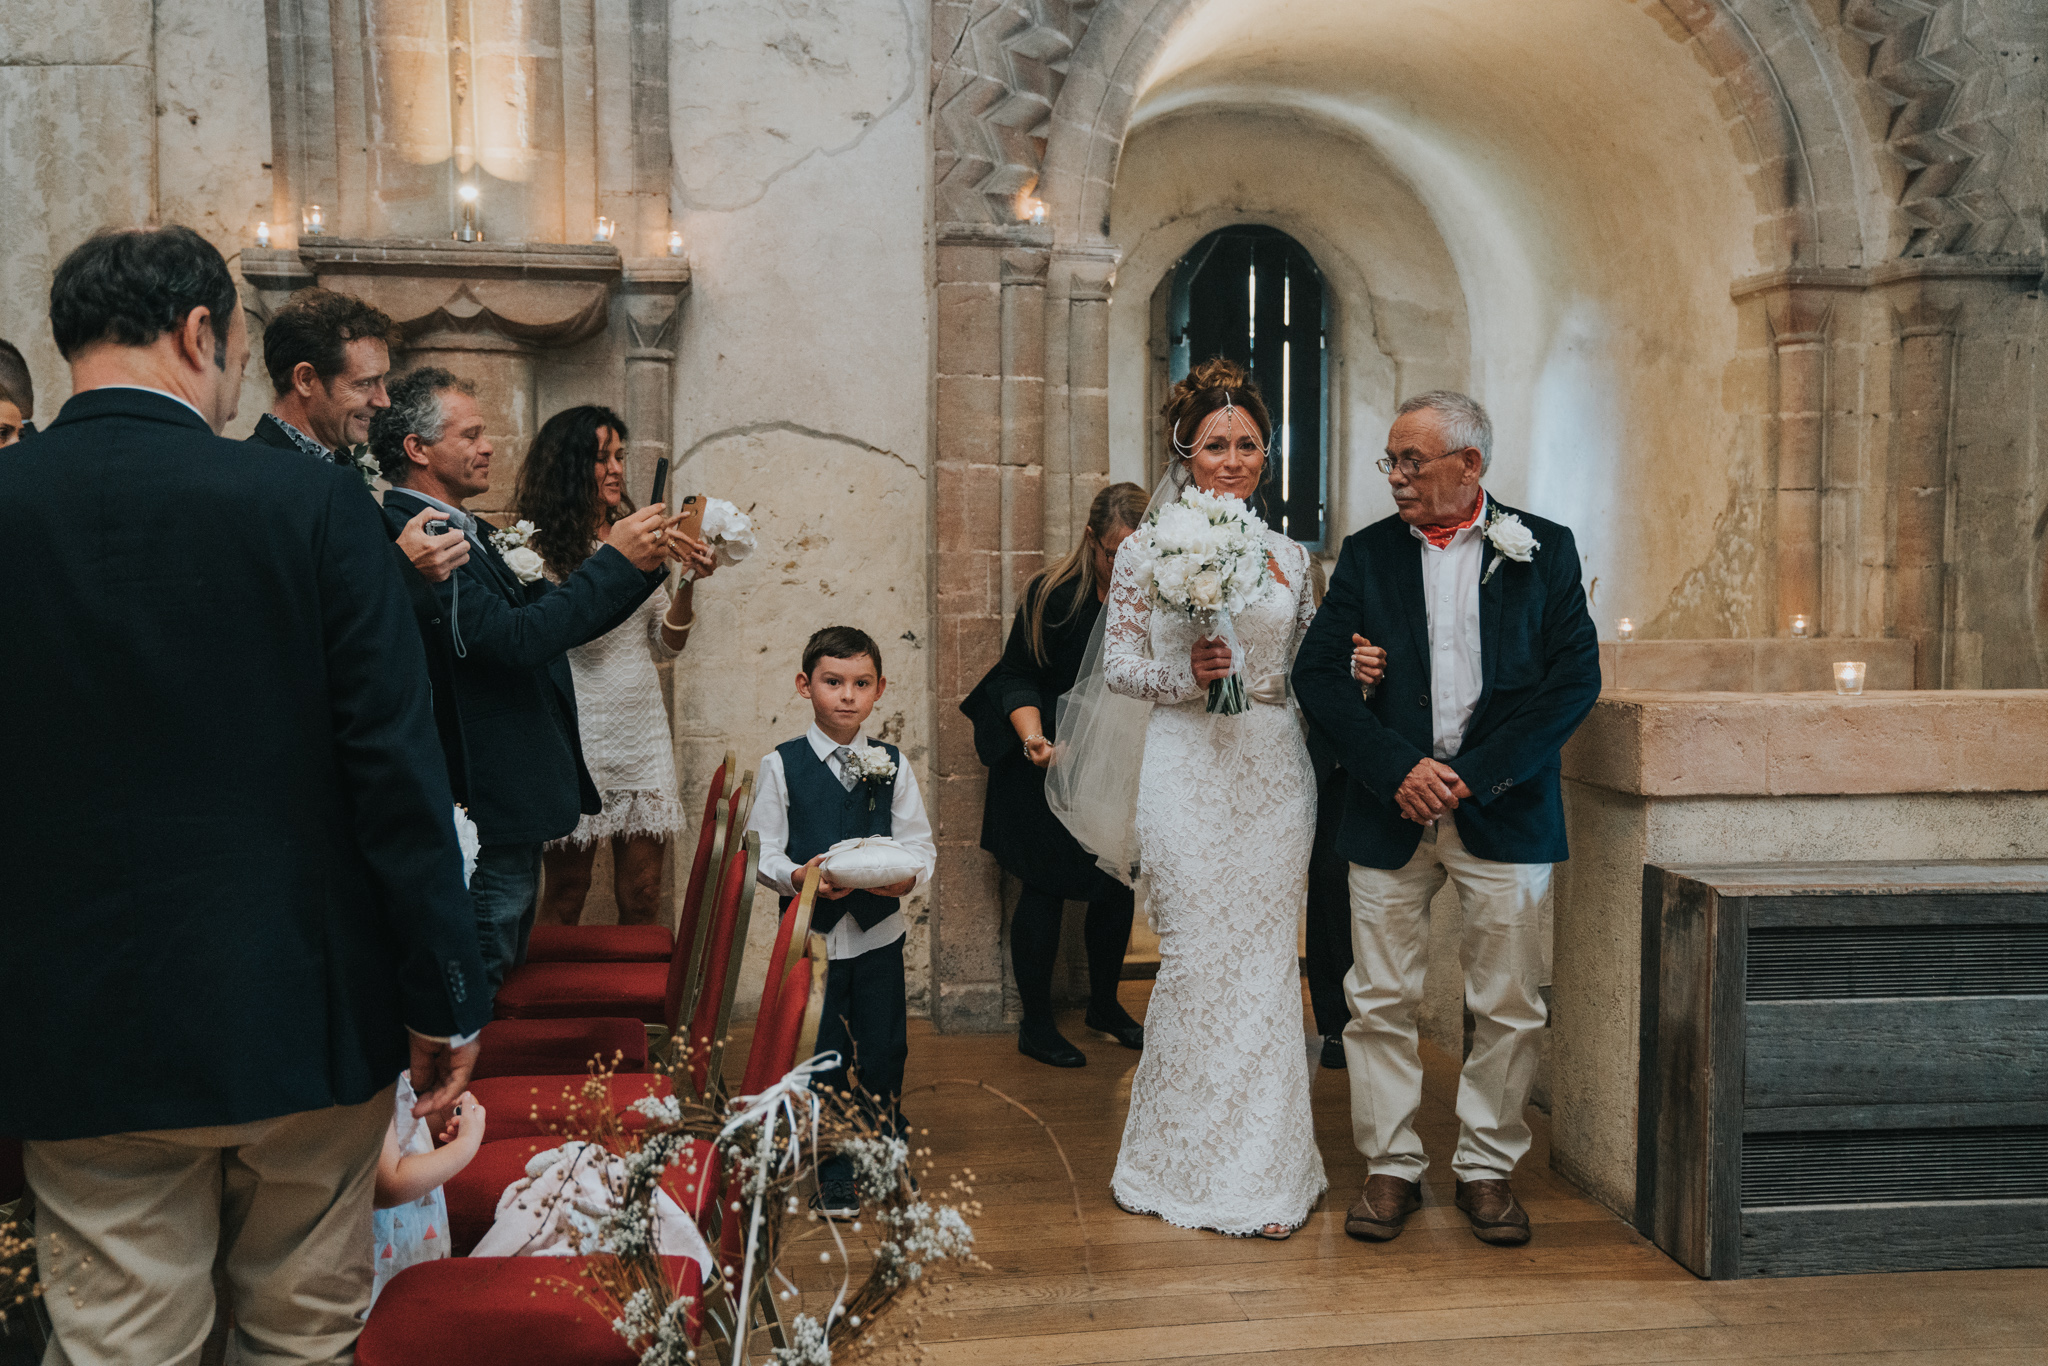 grace-elizabeth-boho-wedding-headingham-castle-essex-wedding-photographer-29.jpg